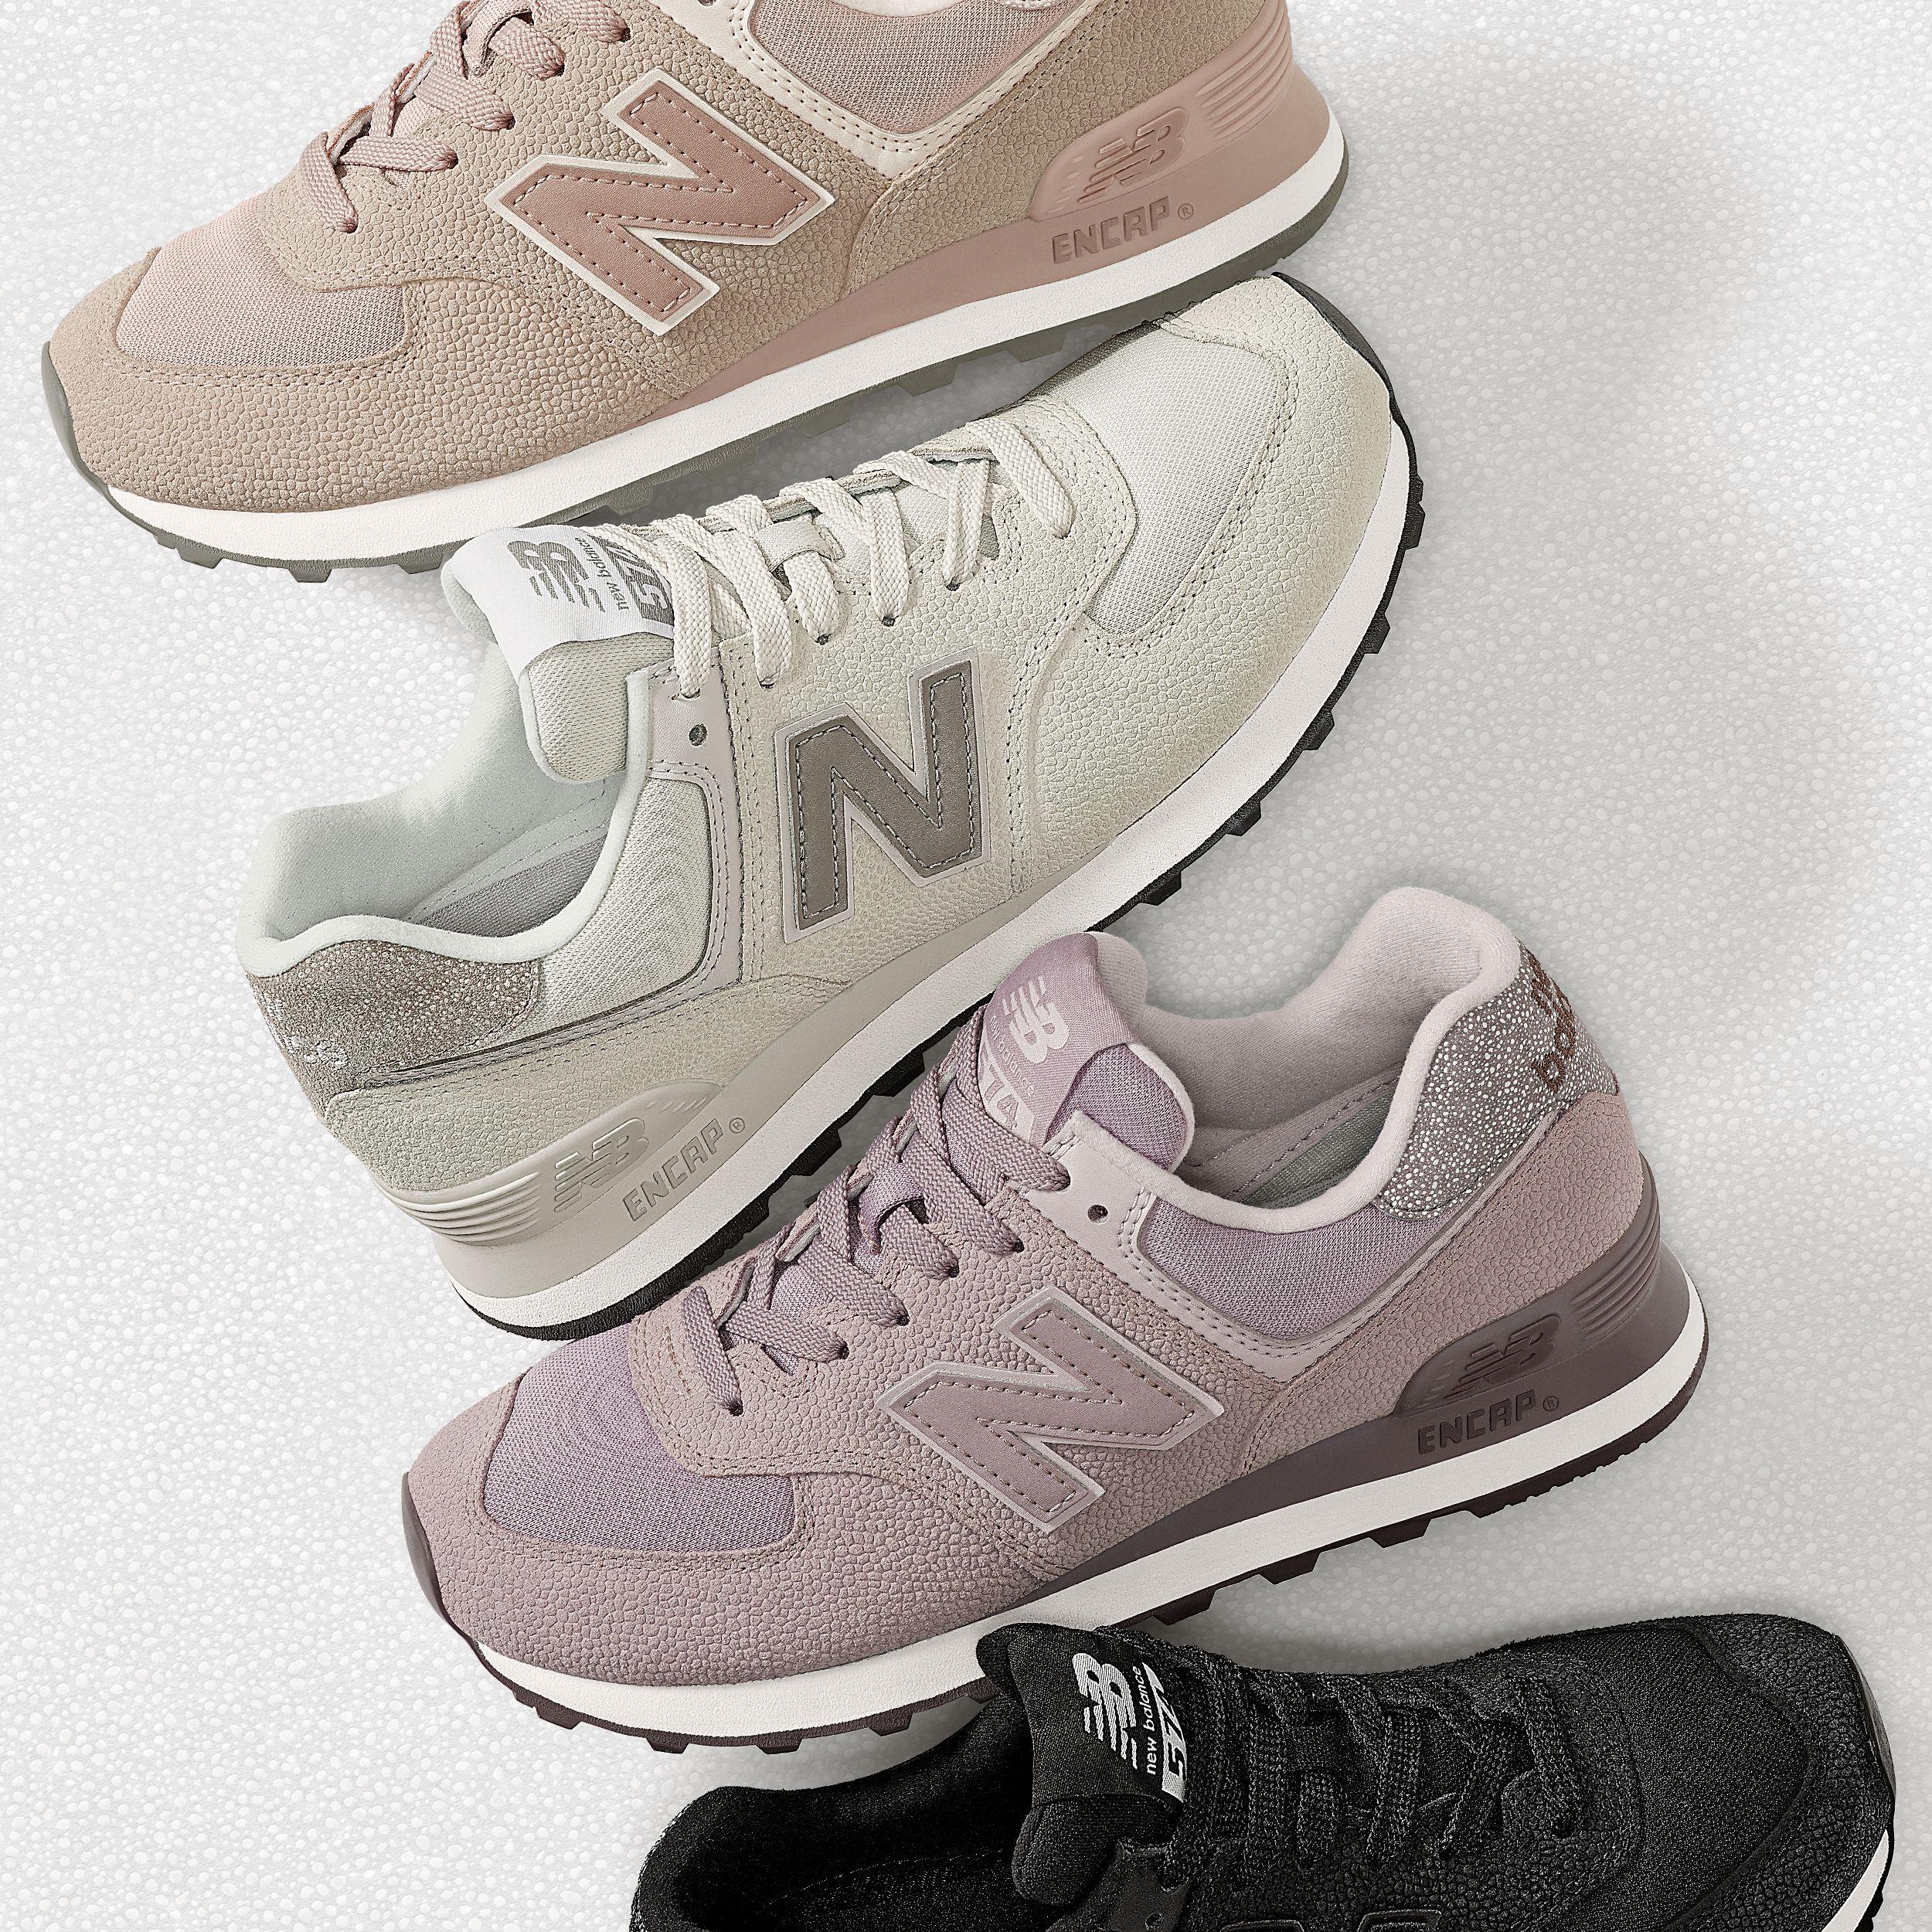 New Balance Women S 574 Pebbled Street New Balance Womens Shoes Tennis Shoes Outfit New Balance Shoes